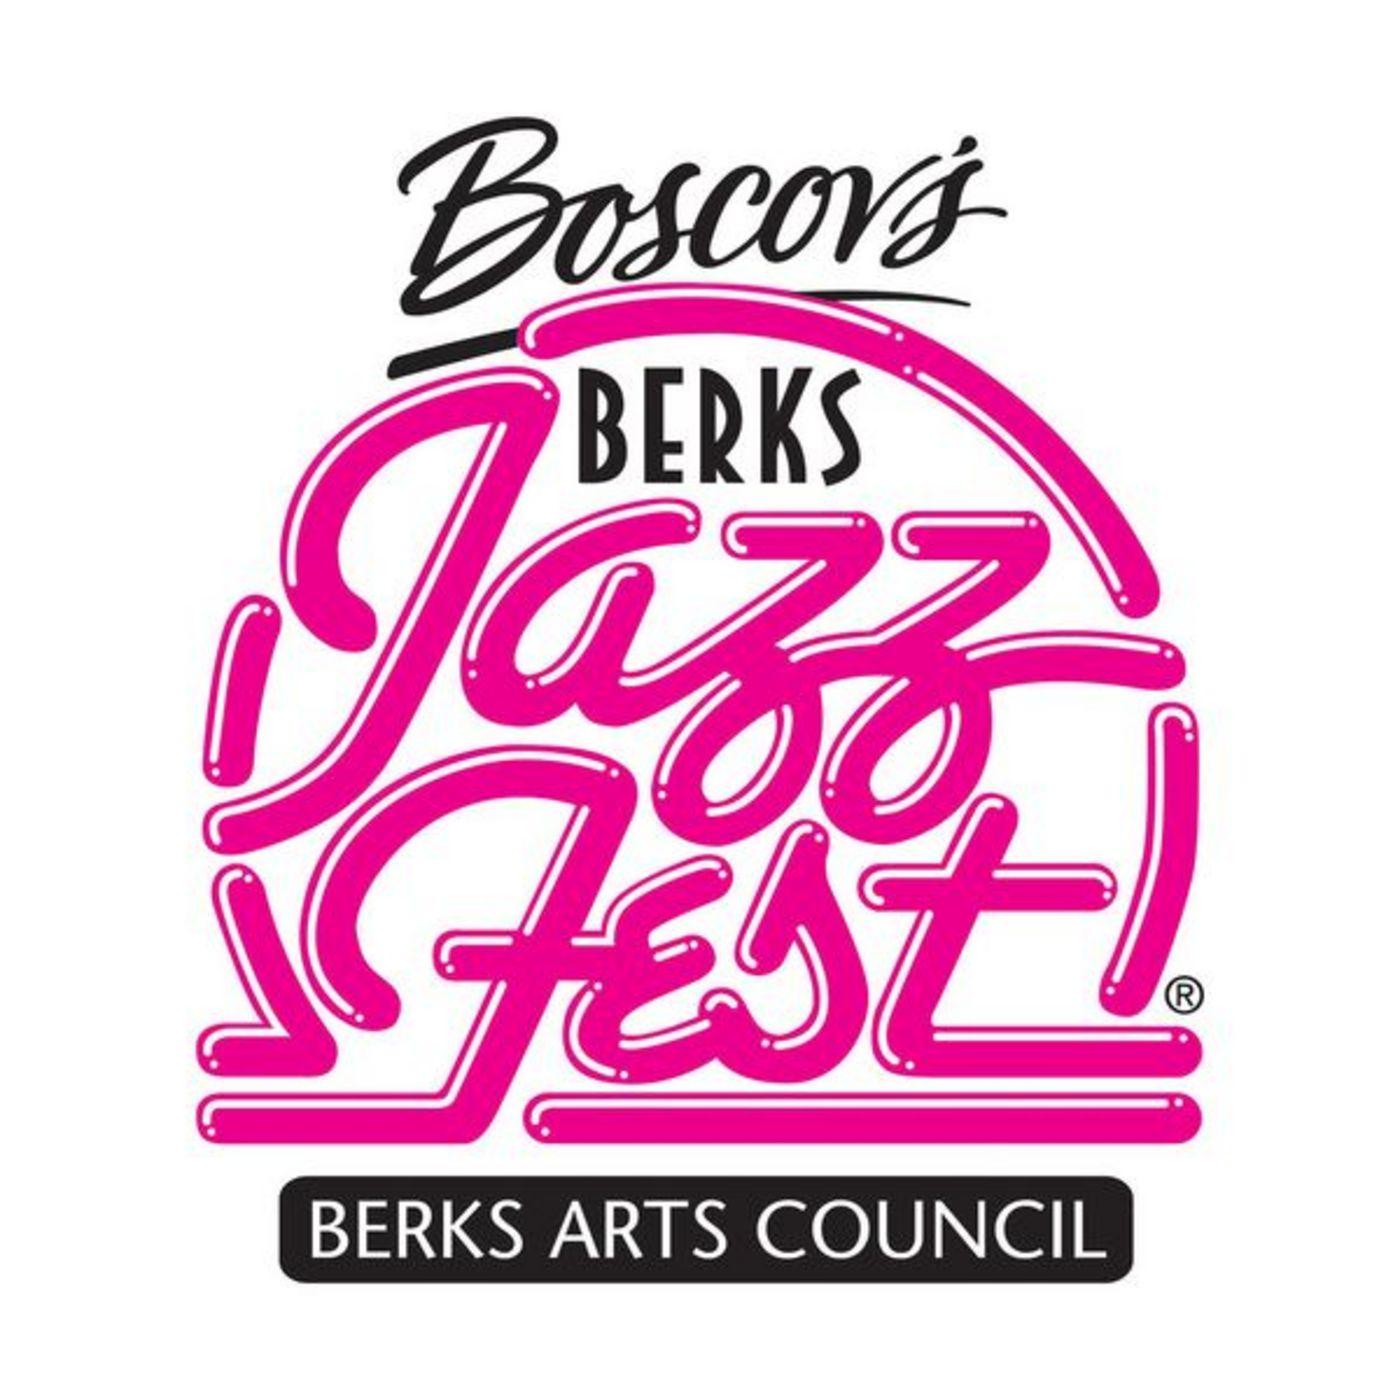 Boscov's Berks Jazz Fest Backstage Pass